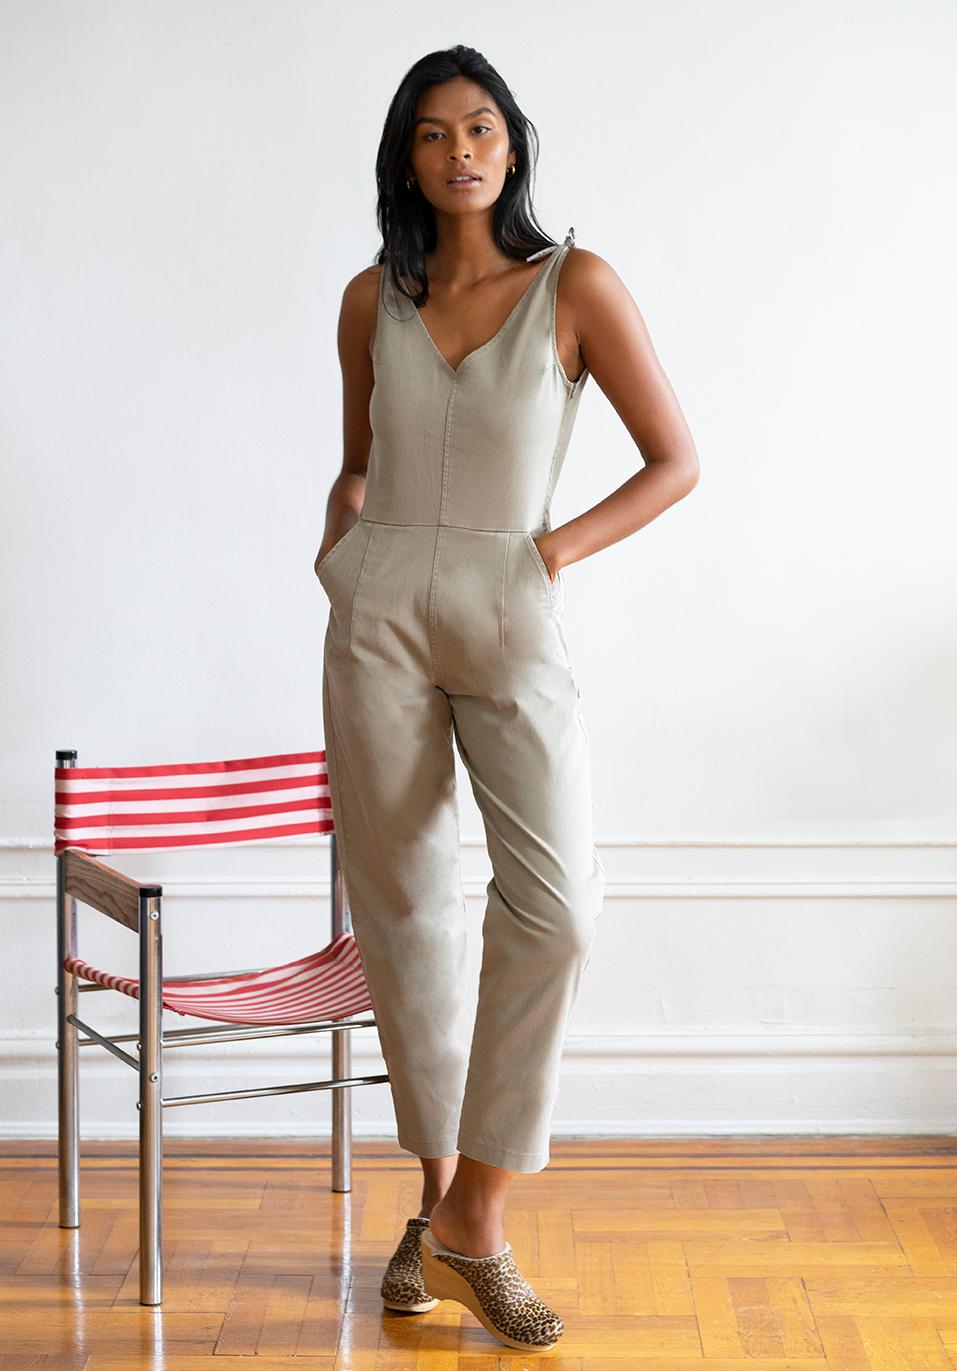 model wearing khaki overalls